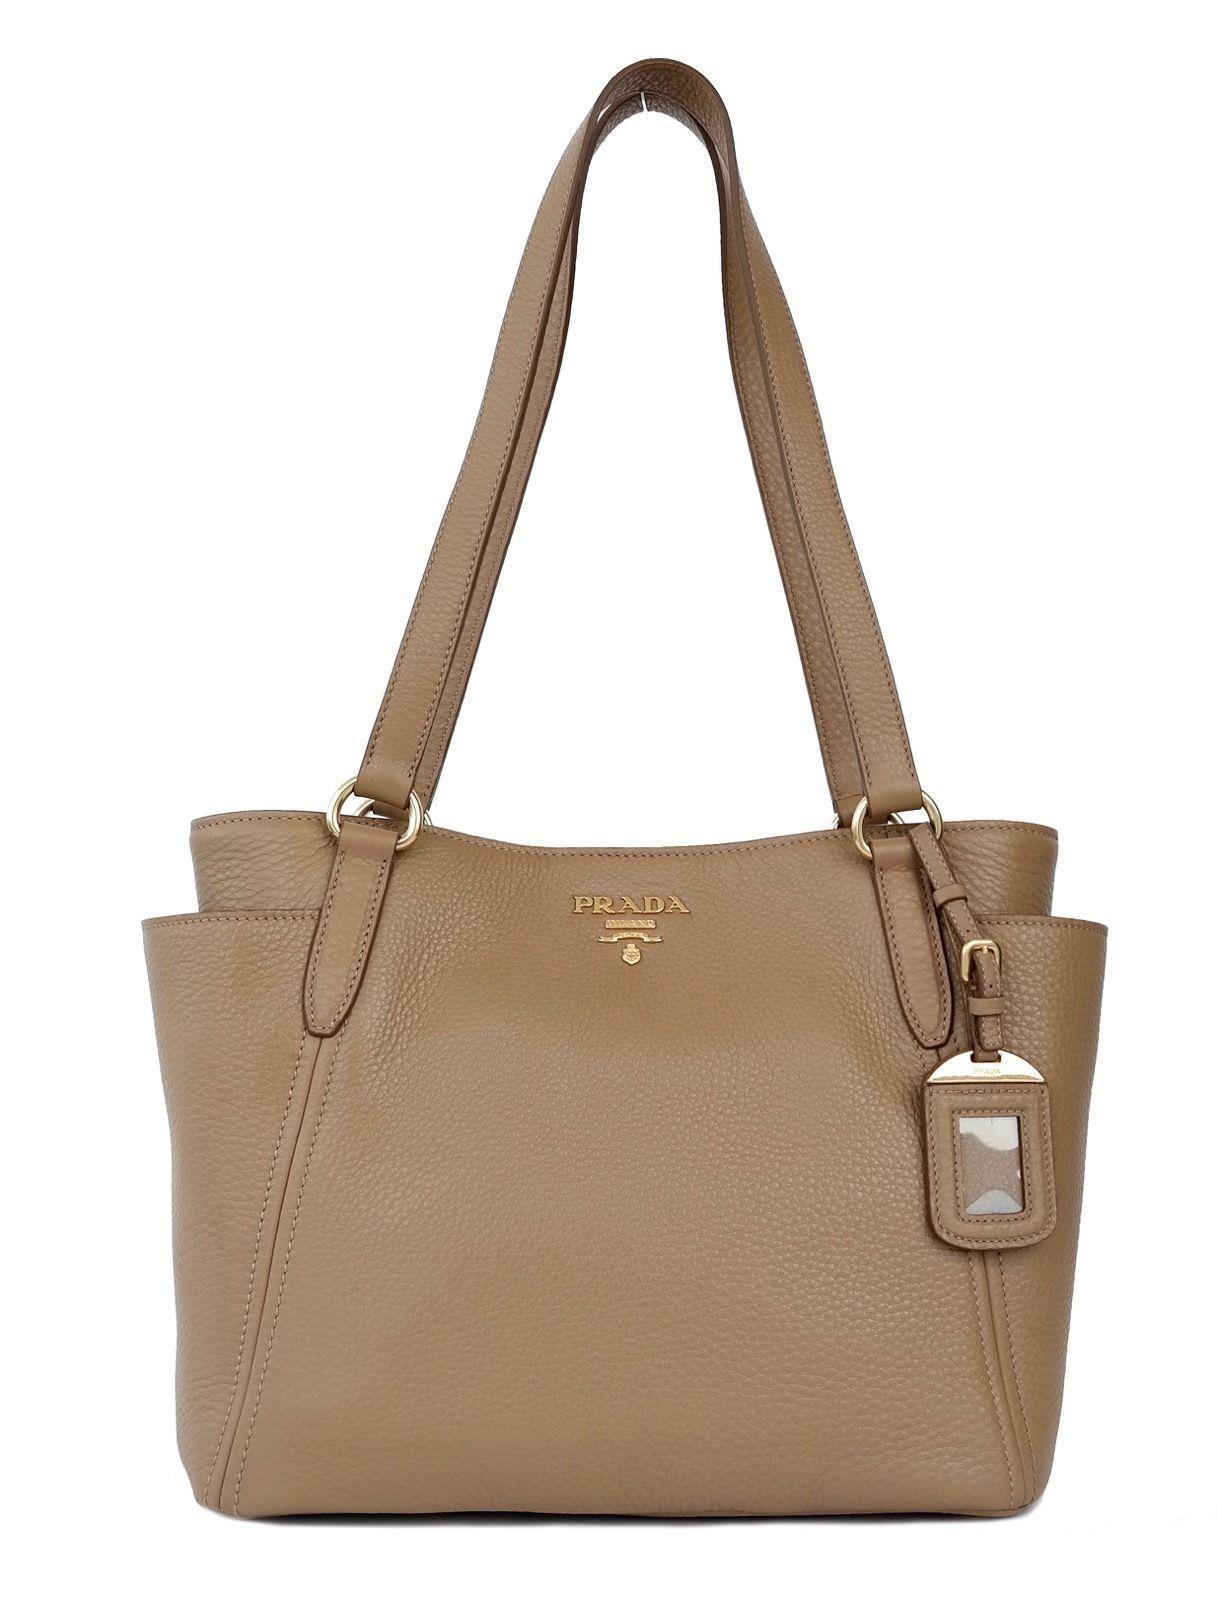 Prada Tote Satchel Leather Side Pocket Shoulder Bag Get One Of The Hottest Styles Season Is